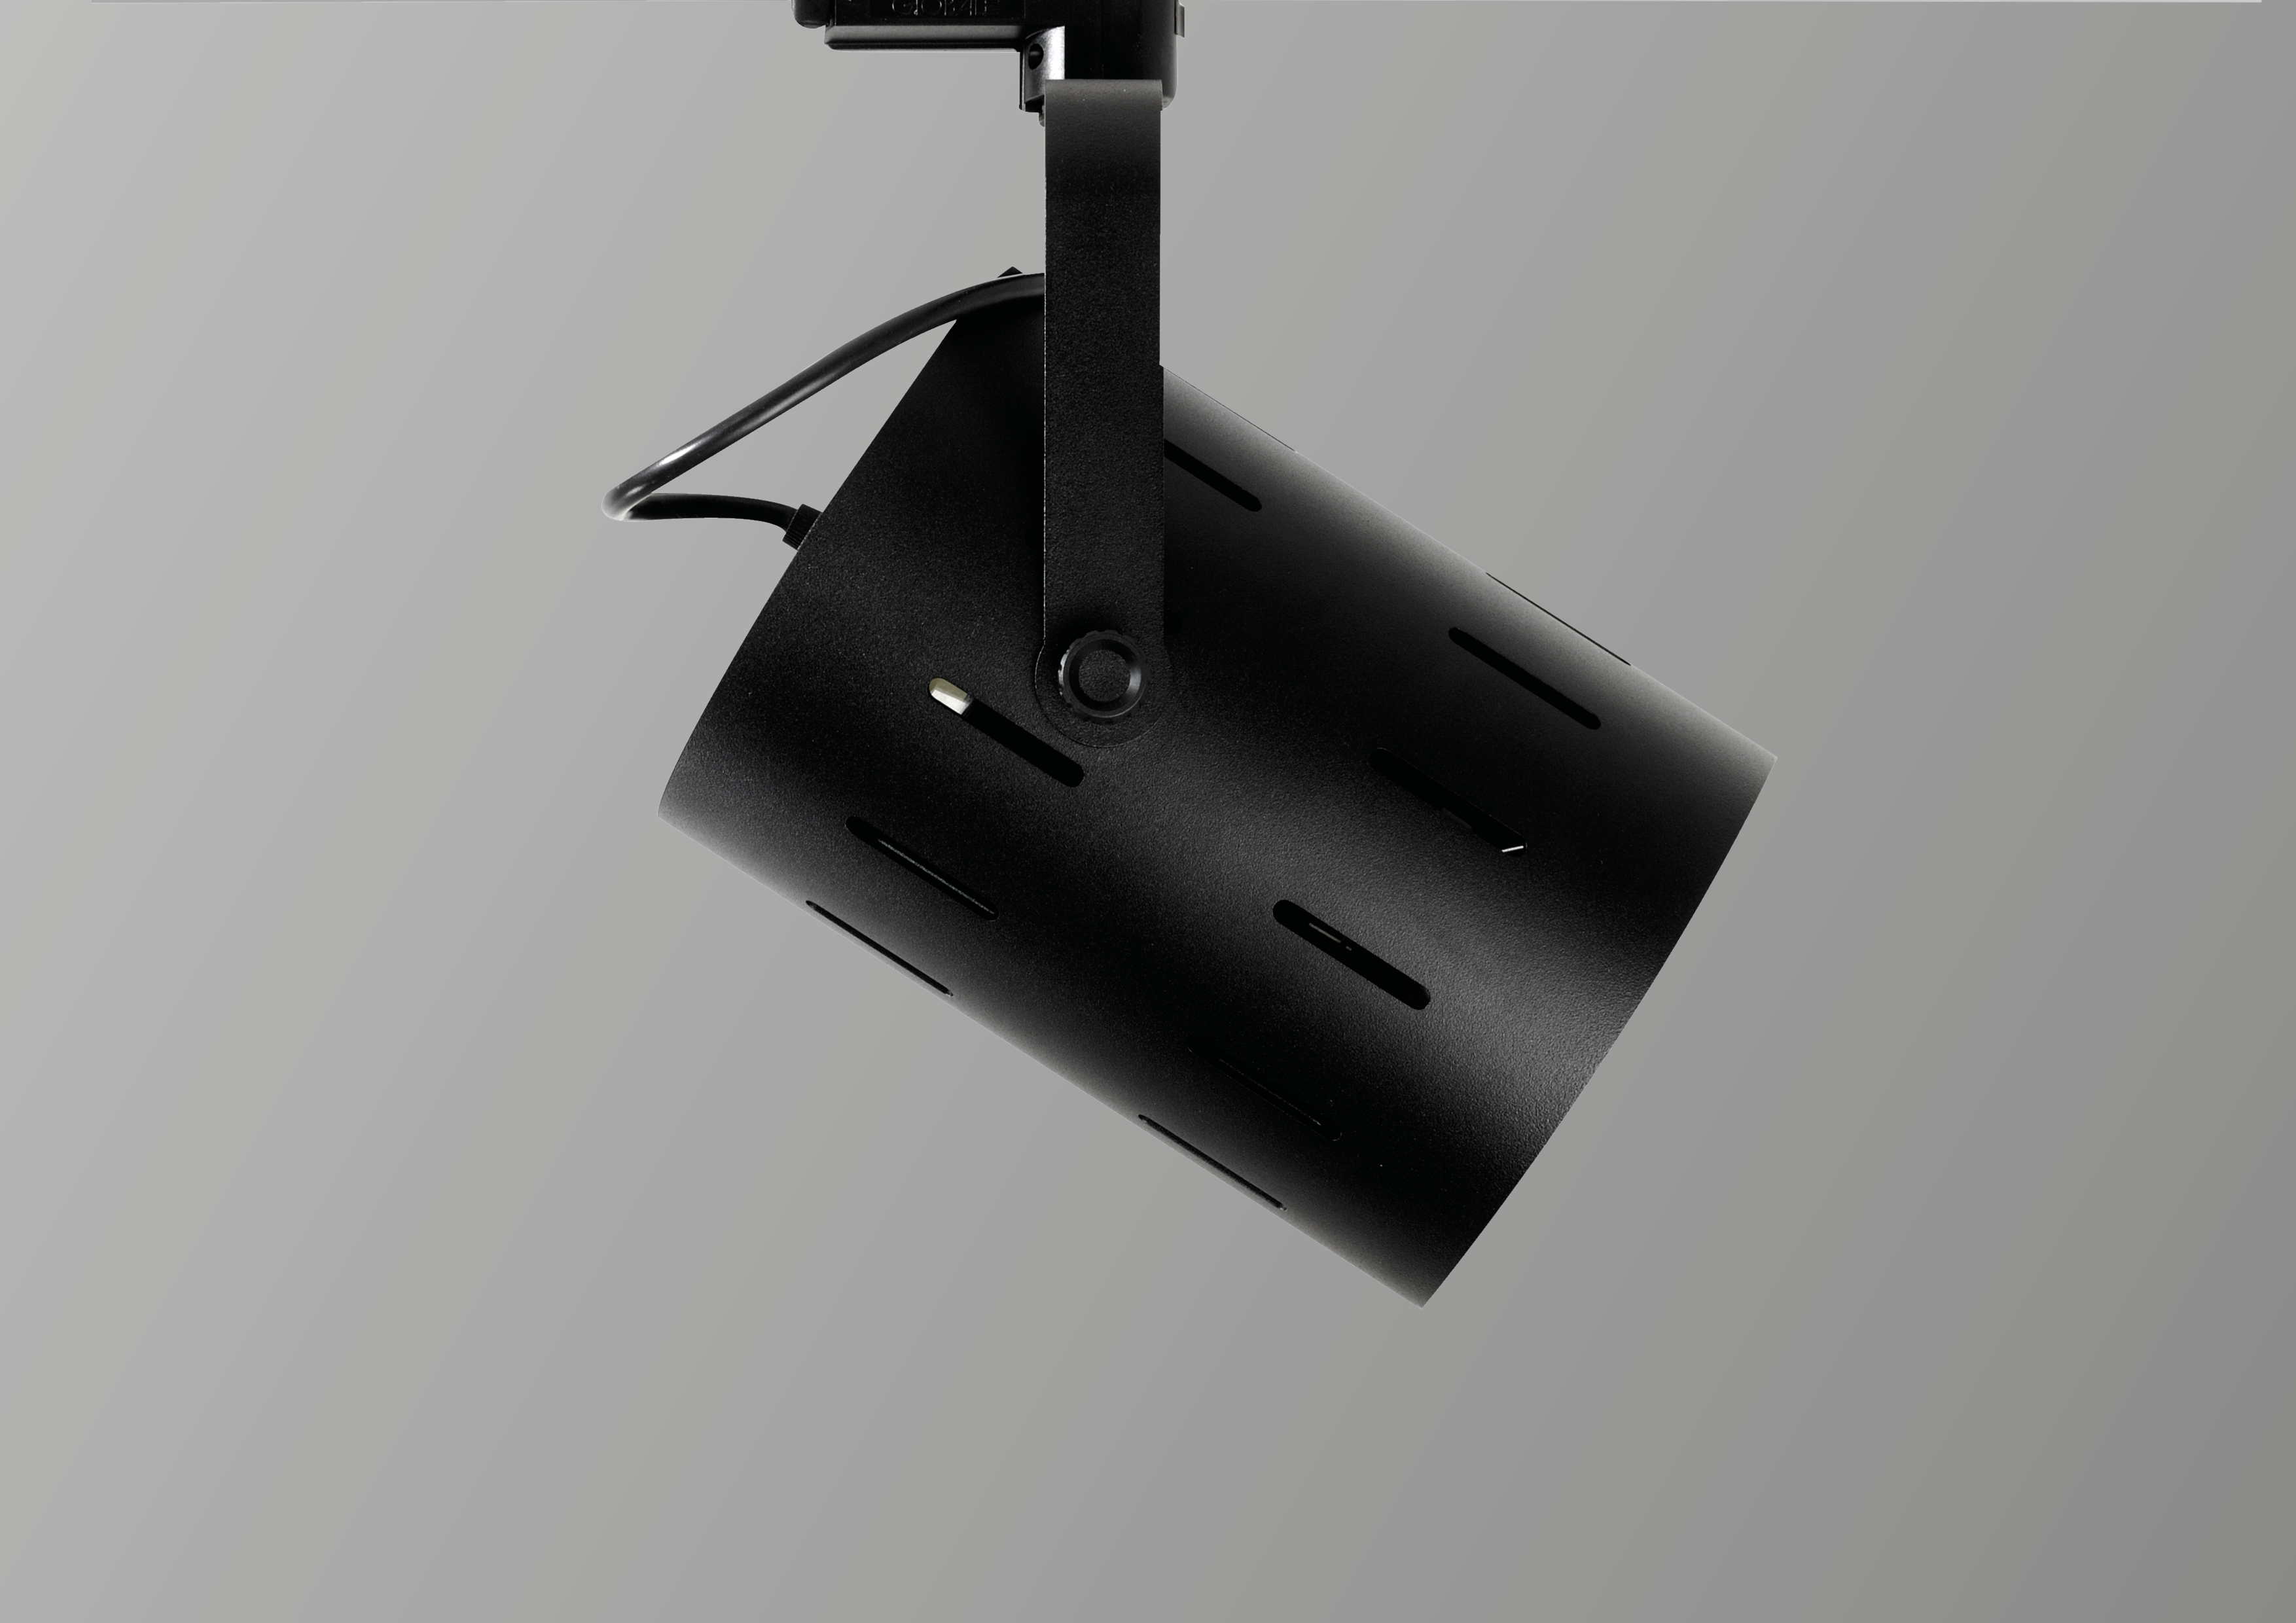 https://contrac-lighting.co.uk/wp-content/uploads/2018/01/QMR-SIDE.jpg